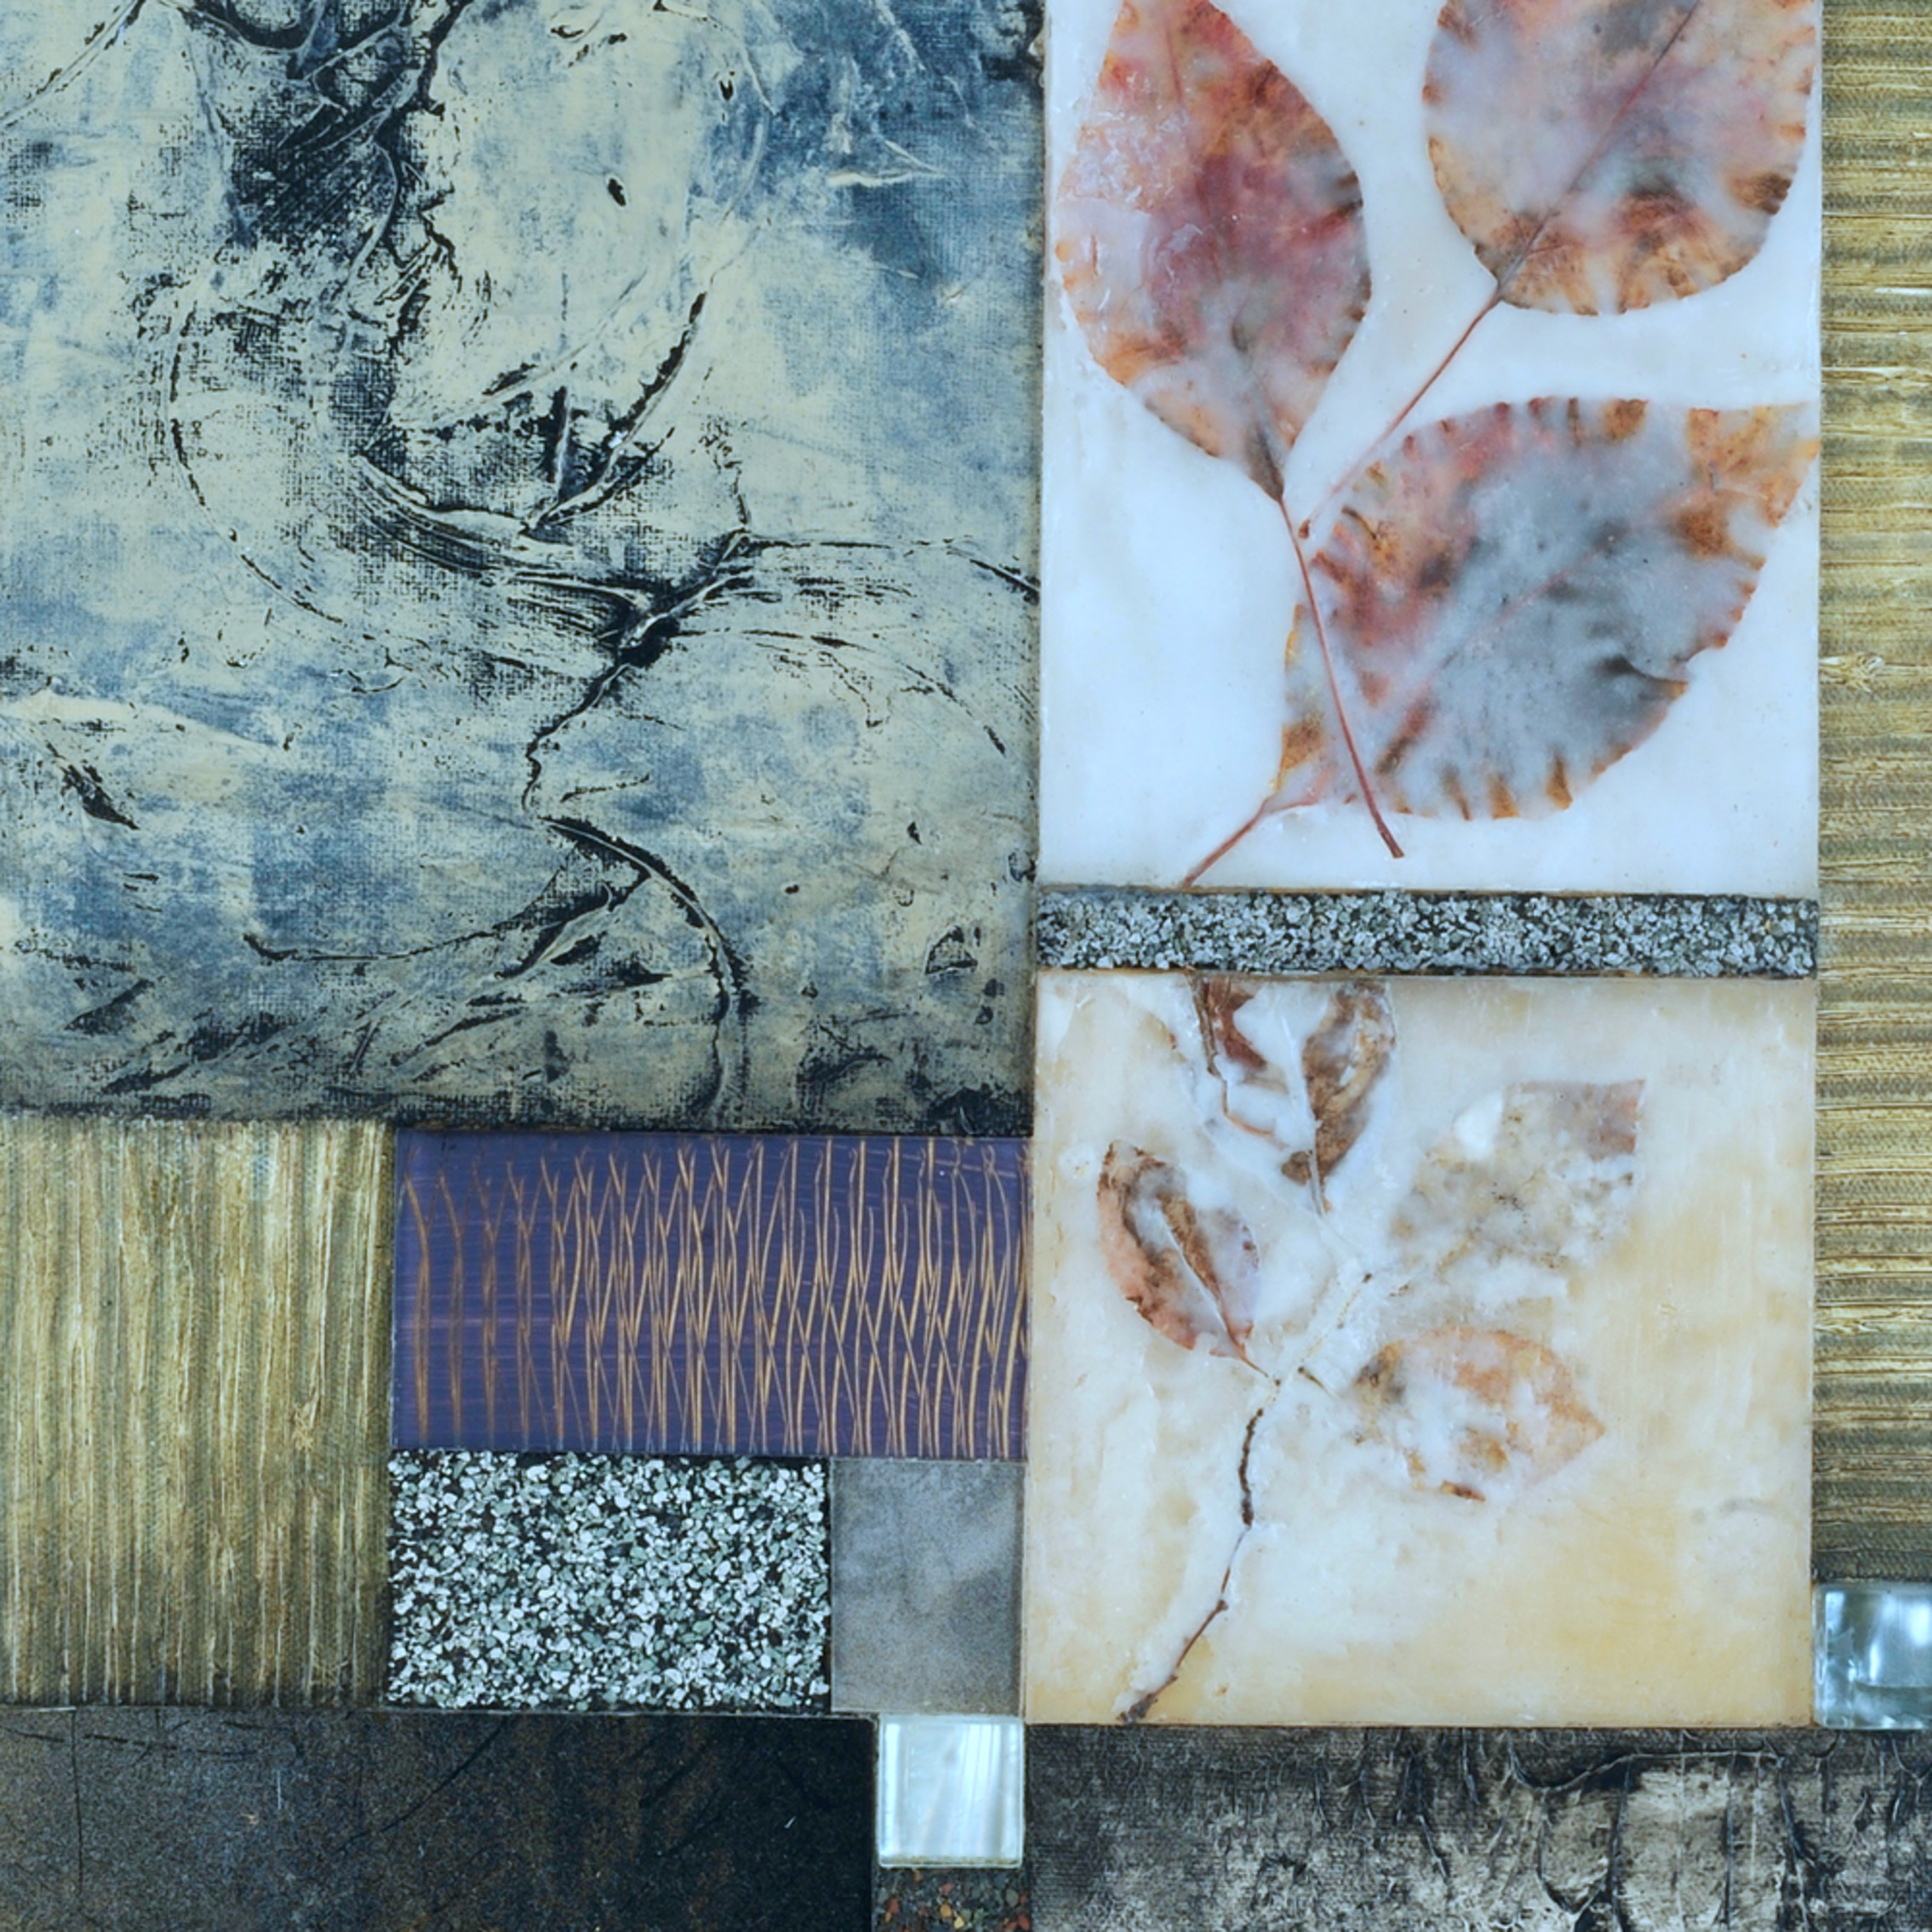 Leaf collage b.tif k8x3ld